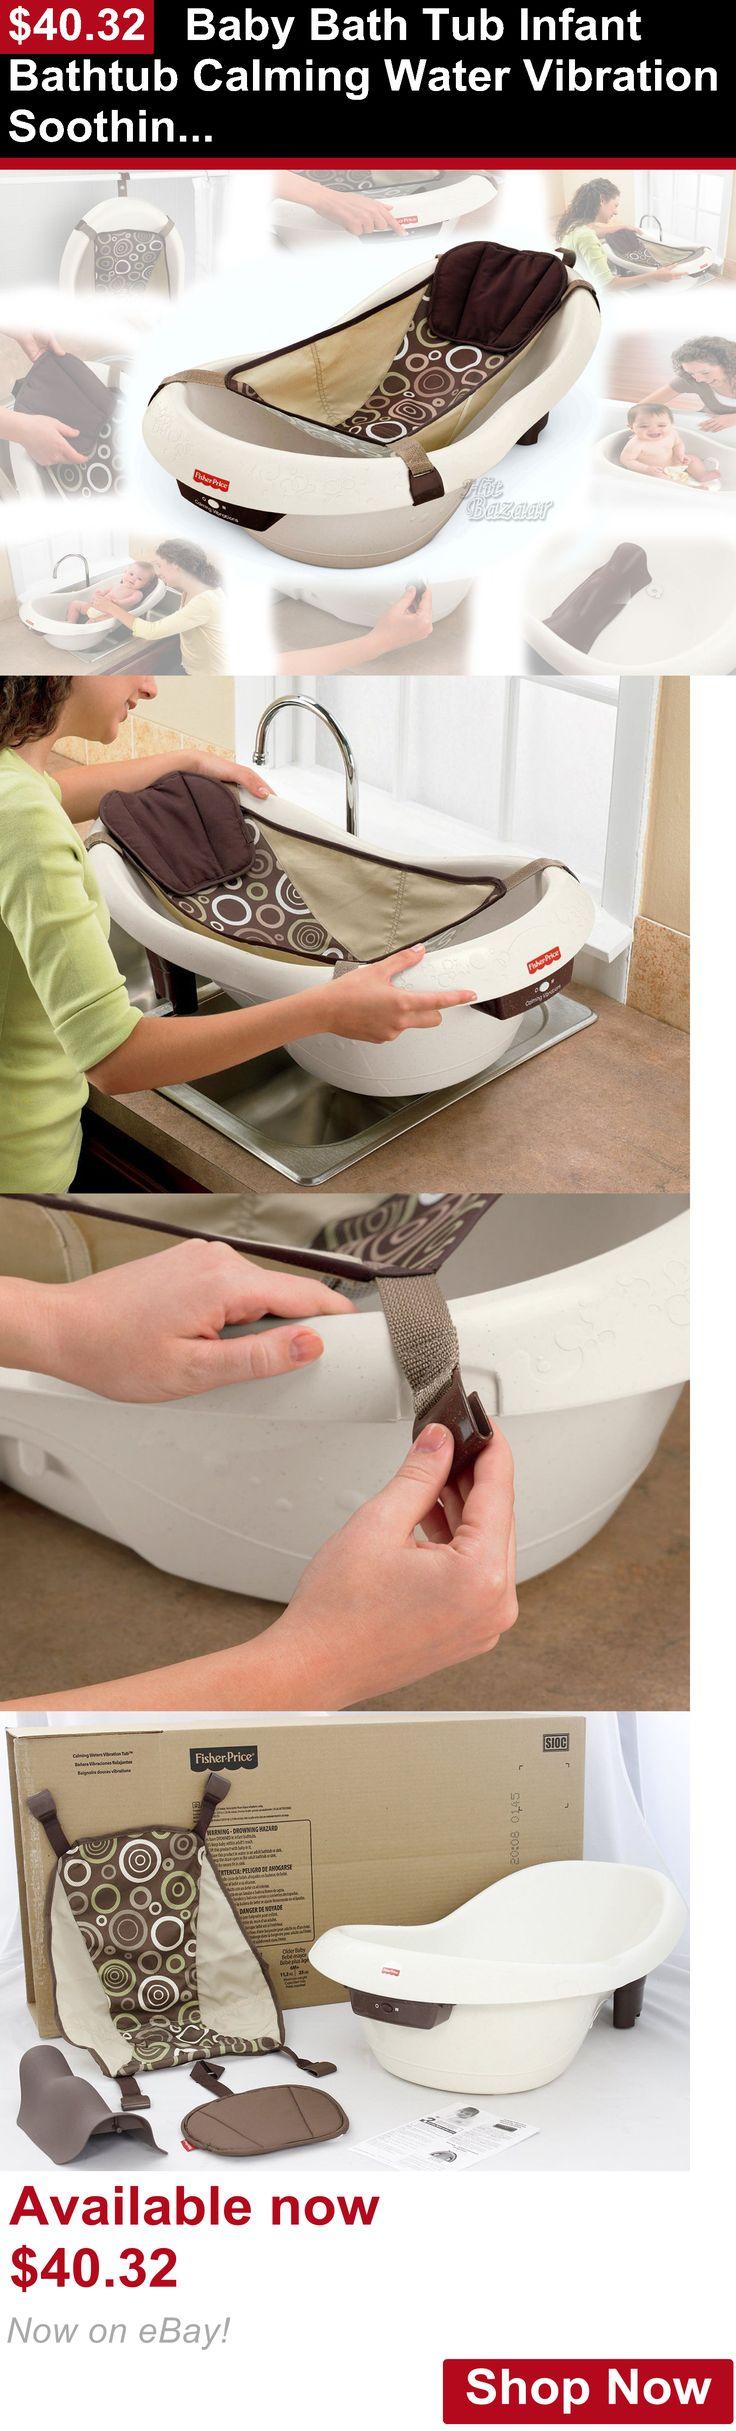 Baby Bath Tubs: Baby Bath Tub Infant Bathtub Calming Water Vibration Soothing Spa Newborn Insert BUY IT NOW ONLY: $40.32